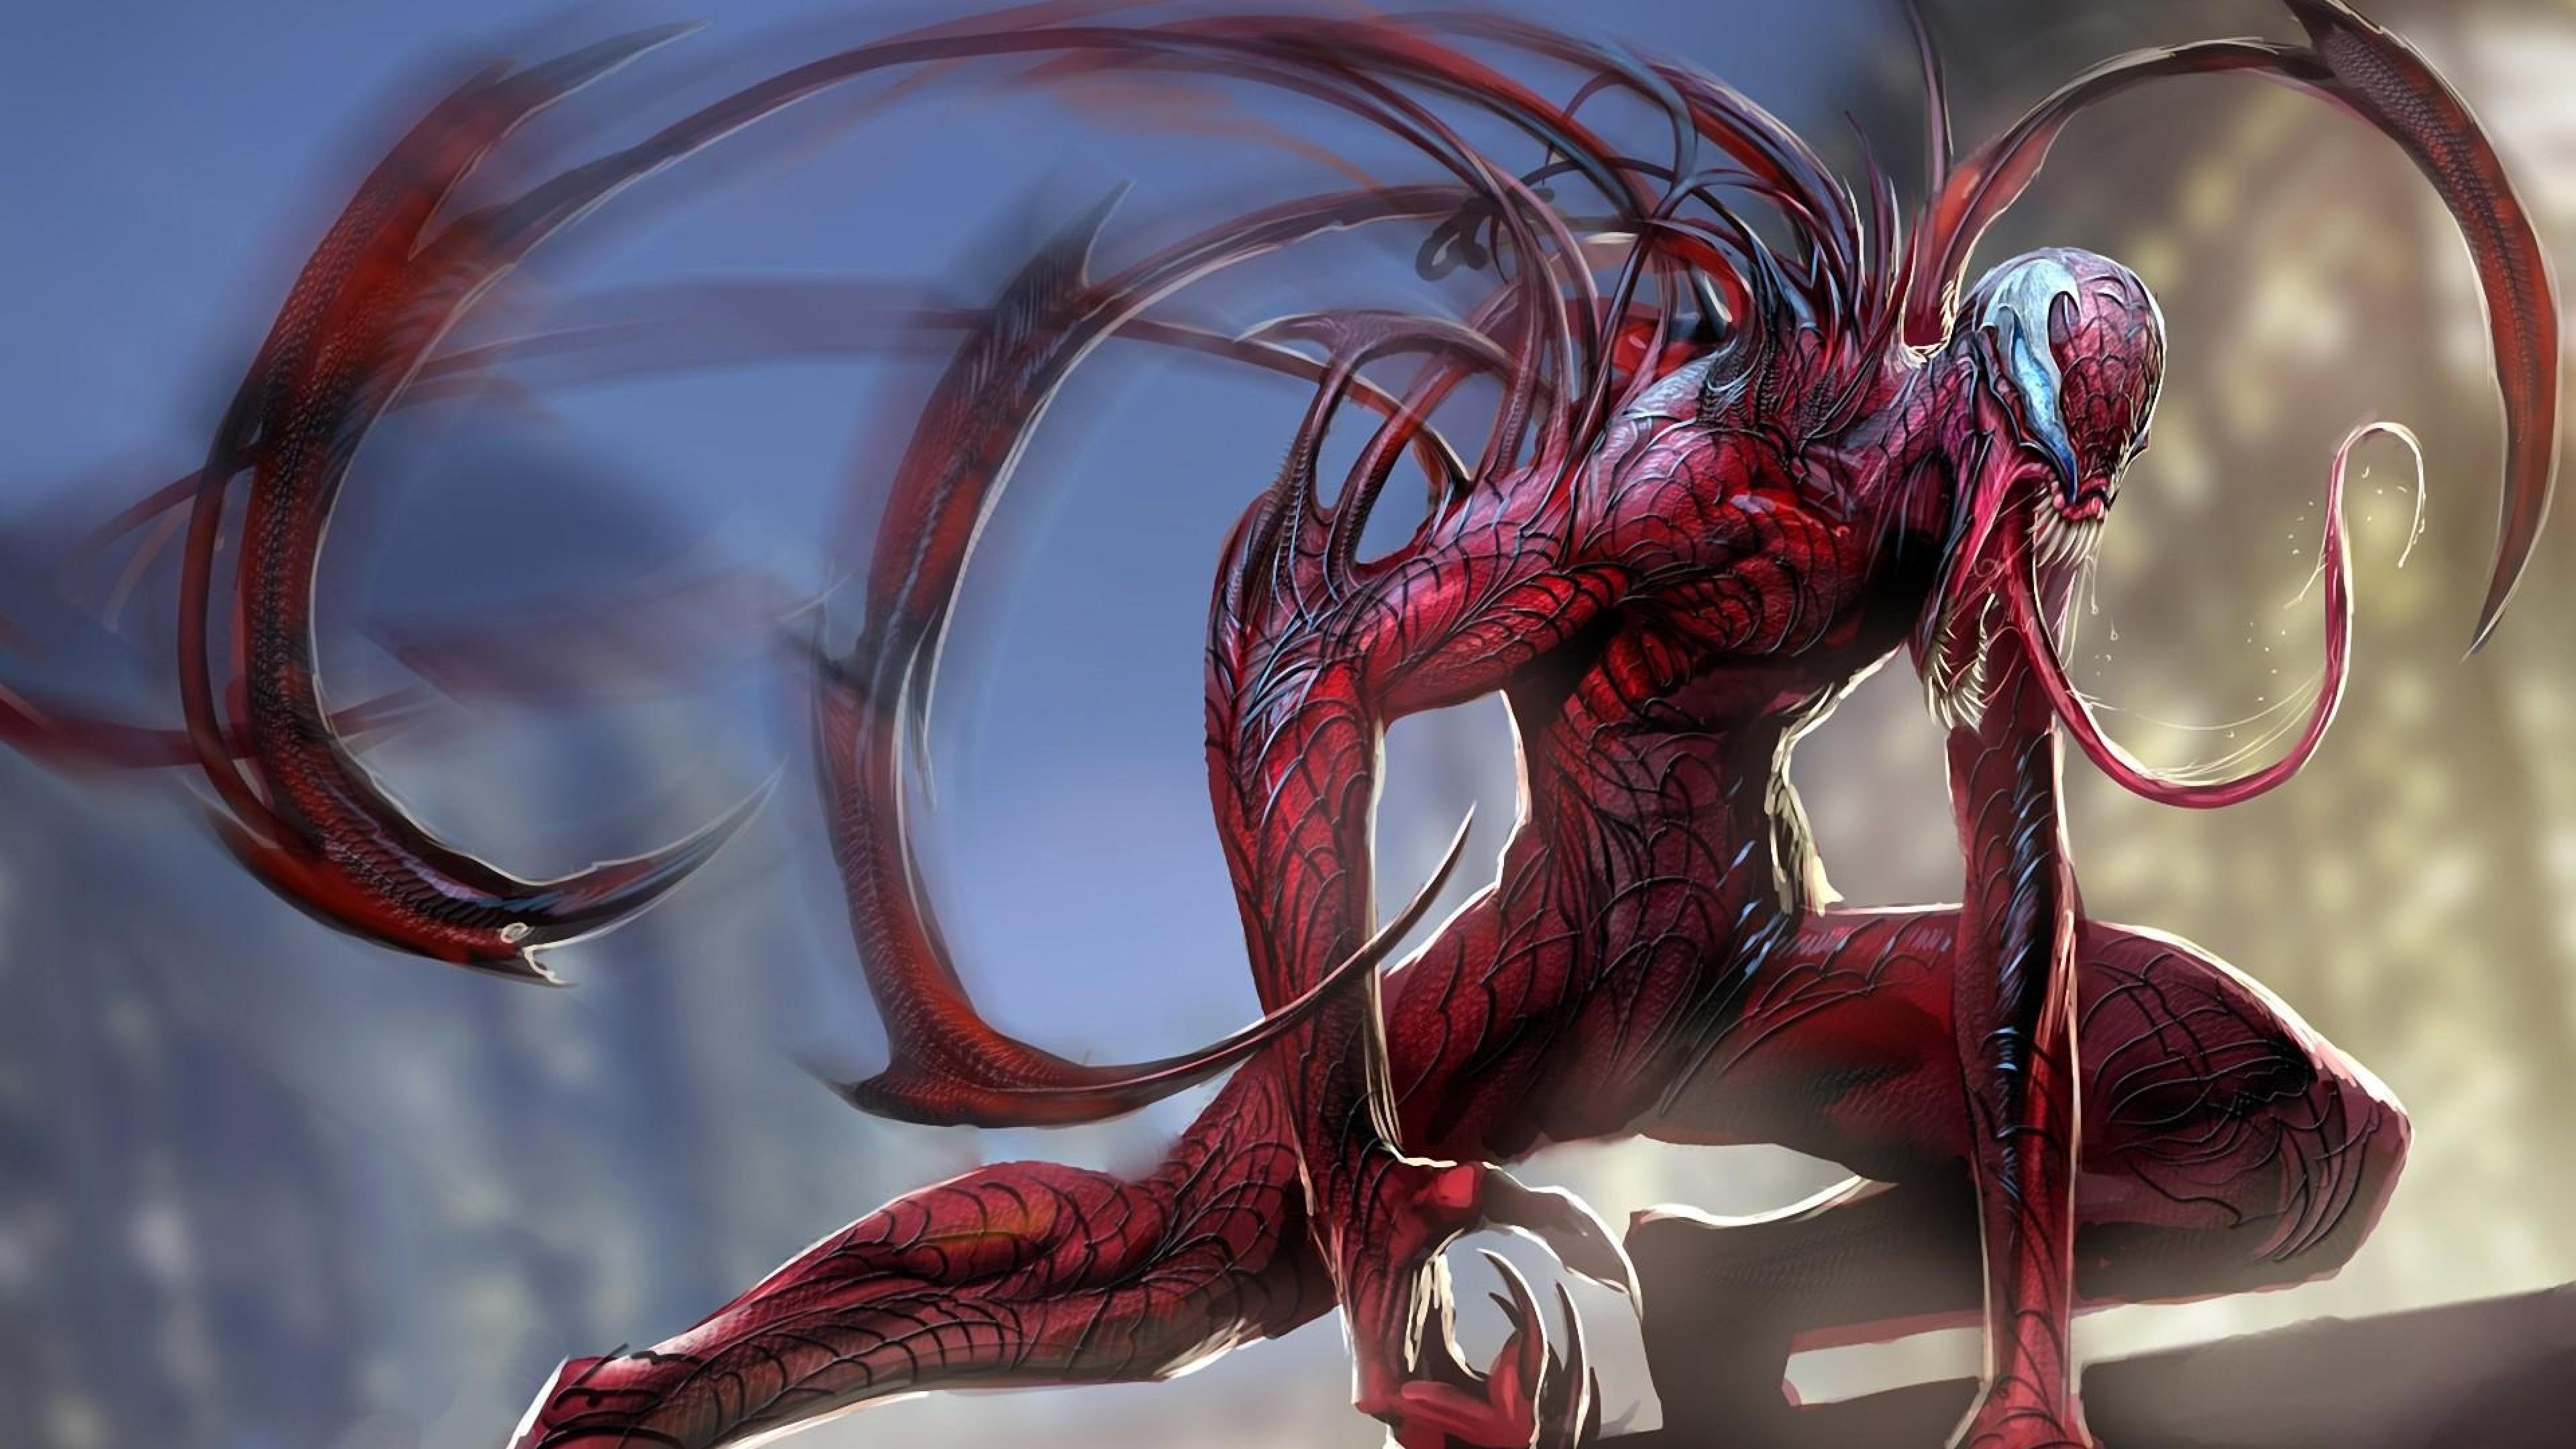 Download Wallpaper 3840x2160 Carnage Spider man language Monster 4K 3840x2160